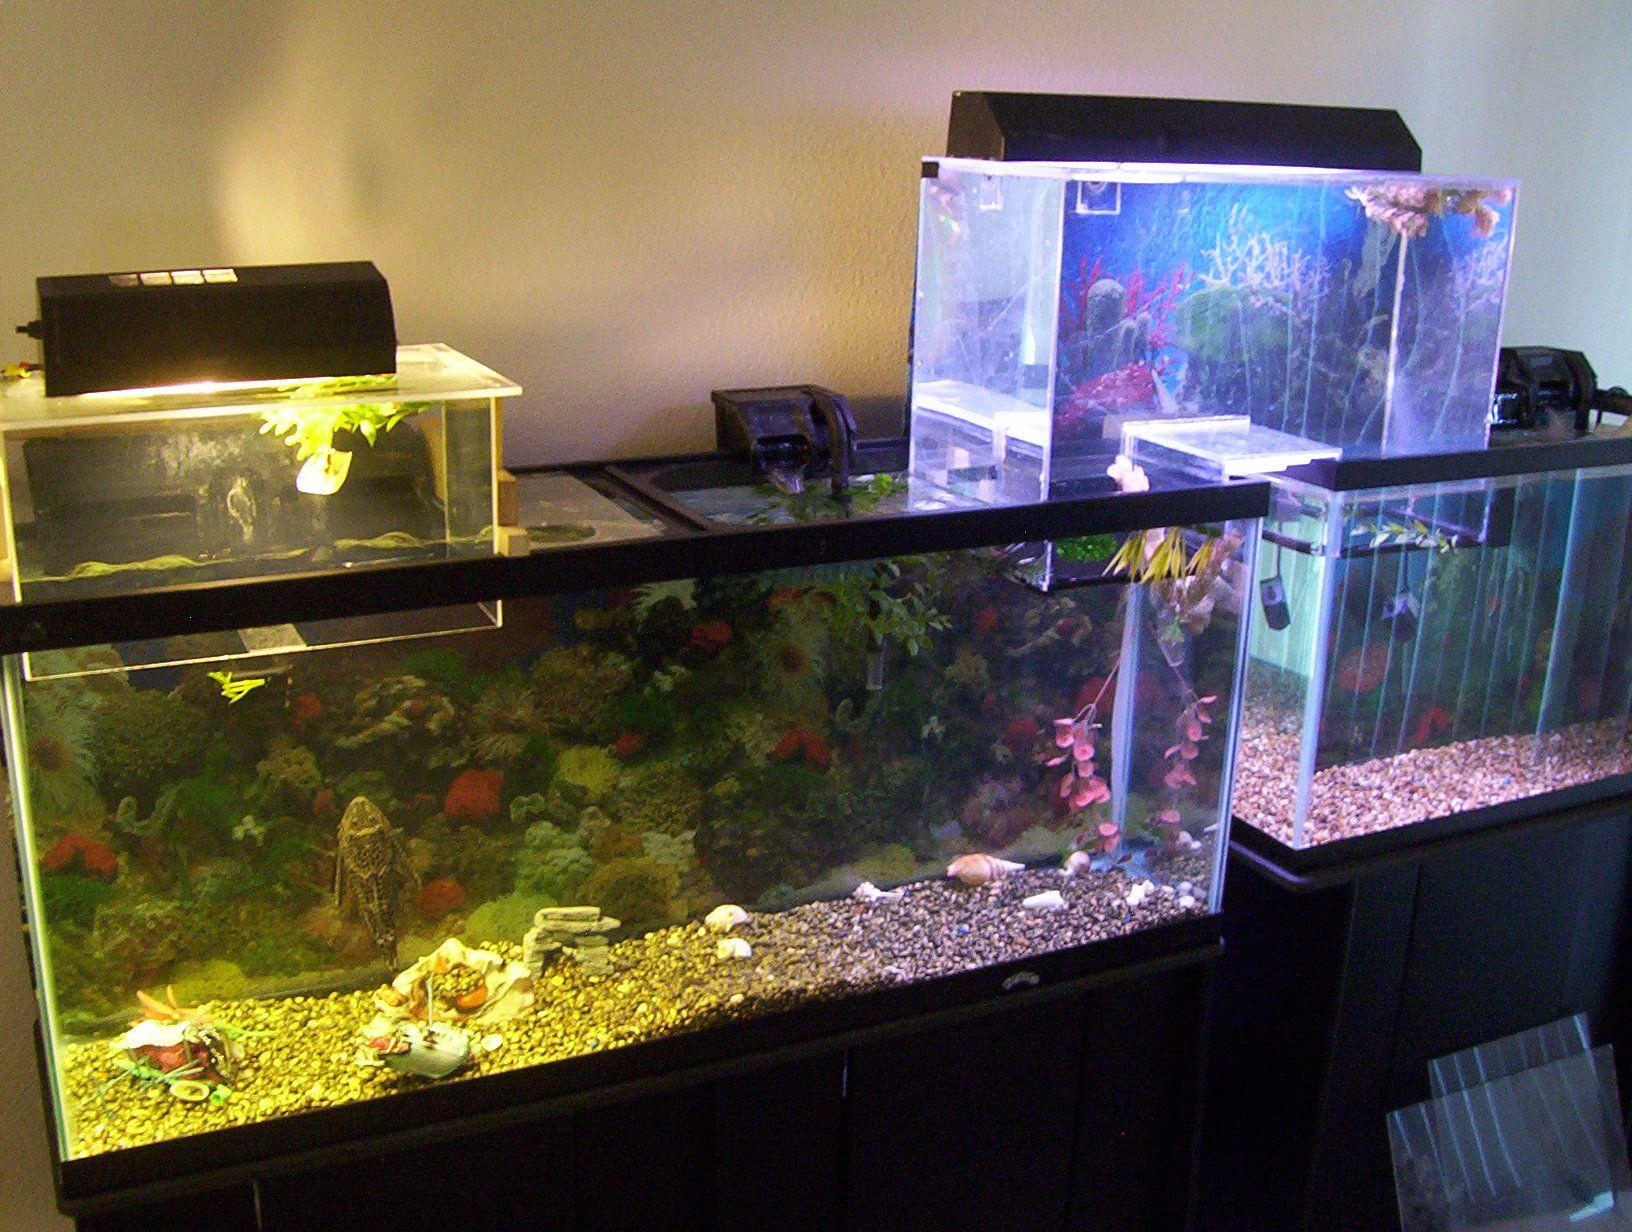 Aquarium fish tank instructions - Aquariums Fish Tanks Connected Fish Tanks Acrylic Aquariums And Instructions Guide To Building An Acrylic Fish Tank Or Fish Tank Tube